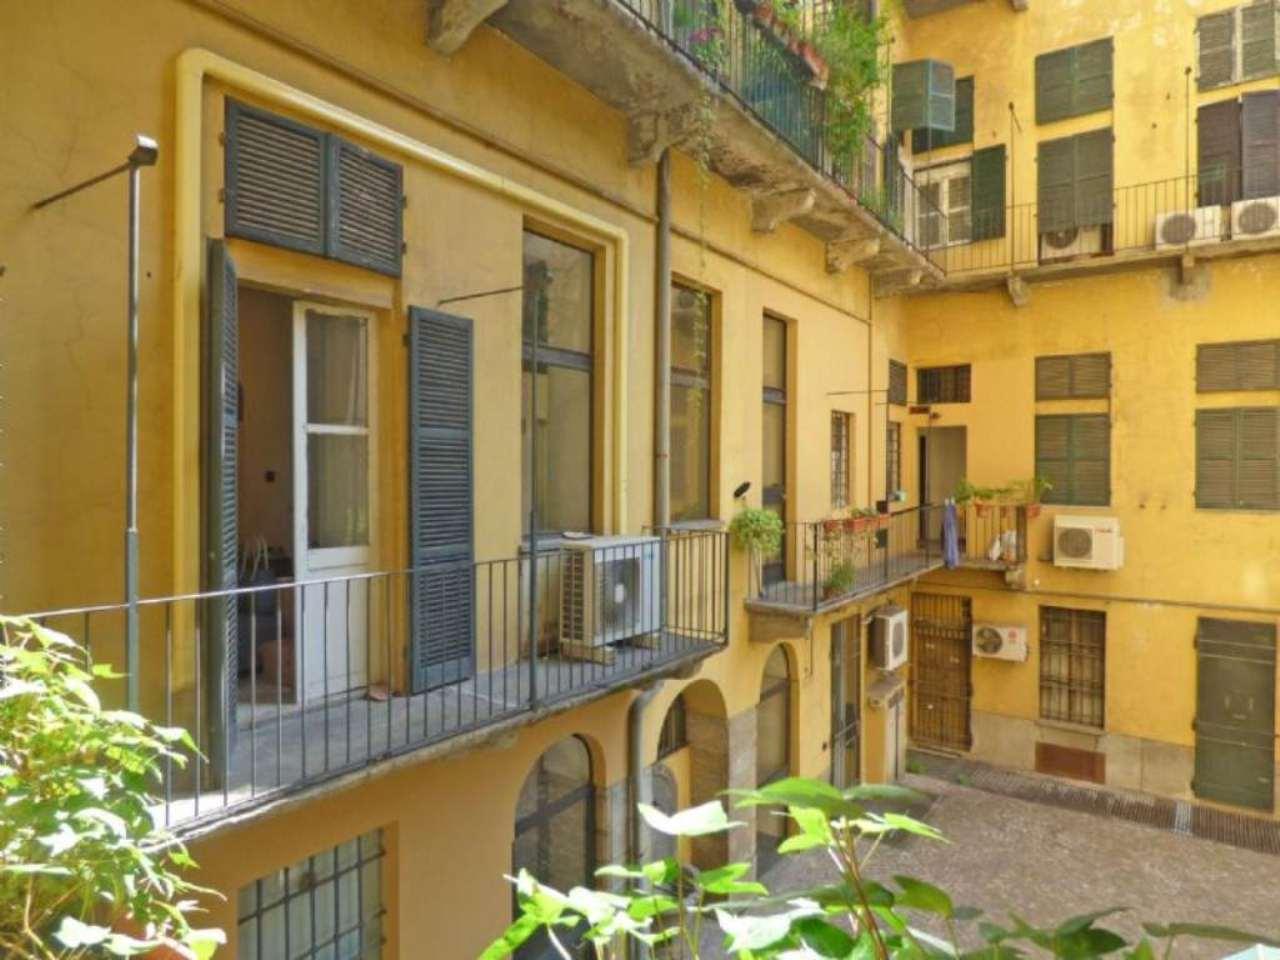 Bilocale Torino Via Garibaldi 1